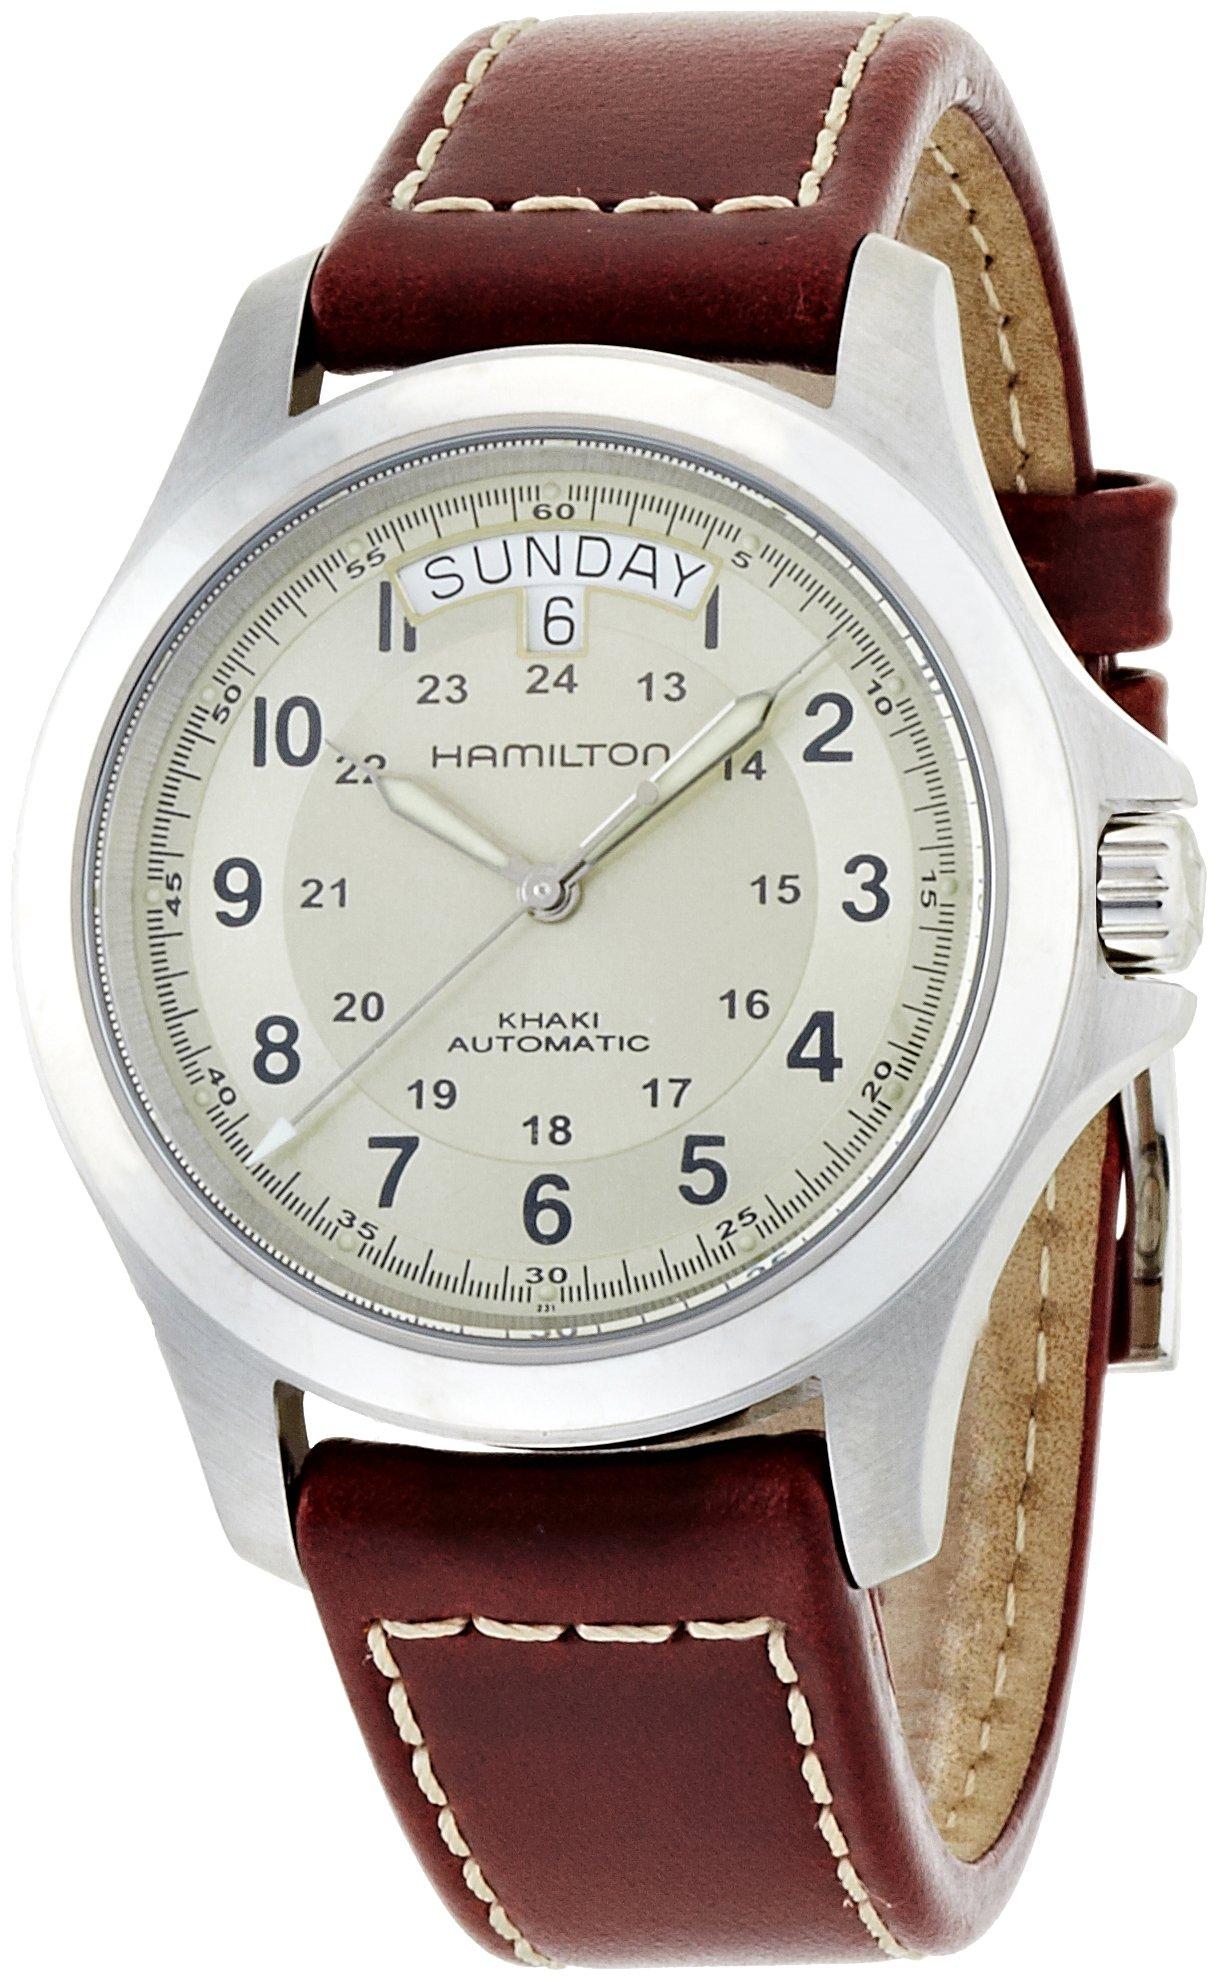 Hamilton – Men's Watch H64455523